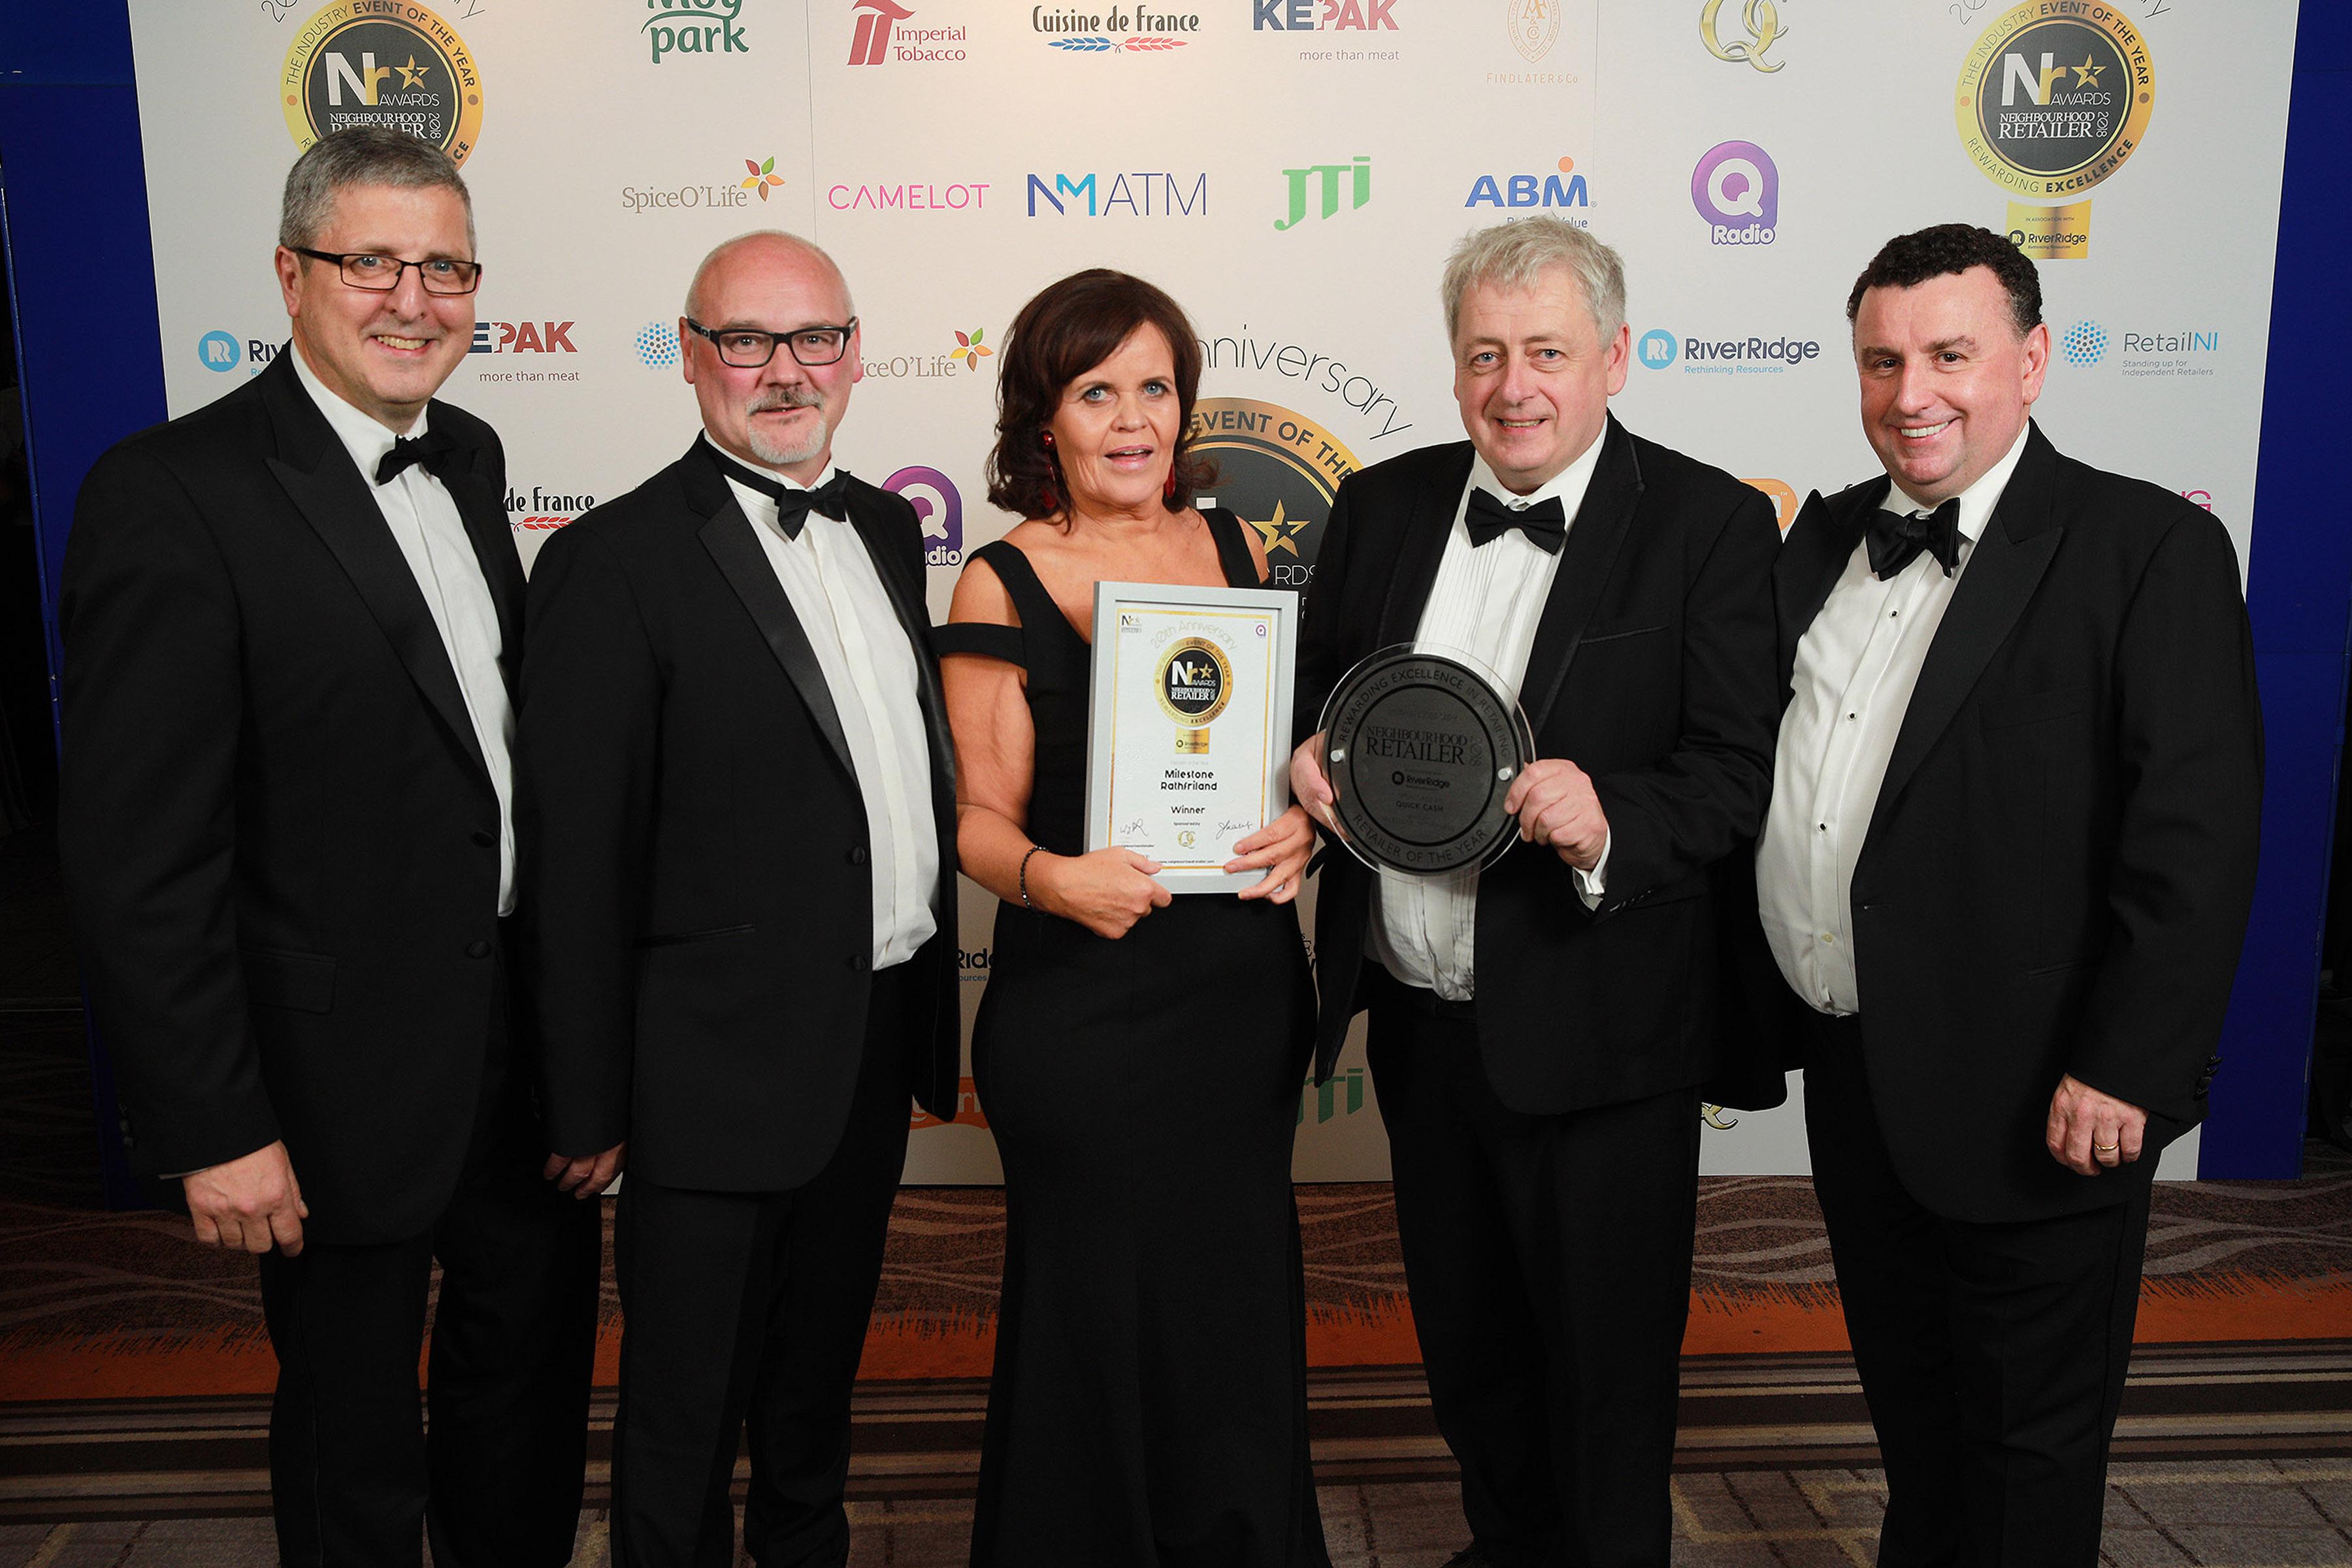 Retailer of the Year Neighbourhood Retailer Awards